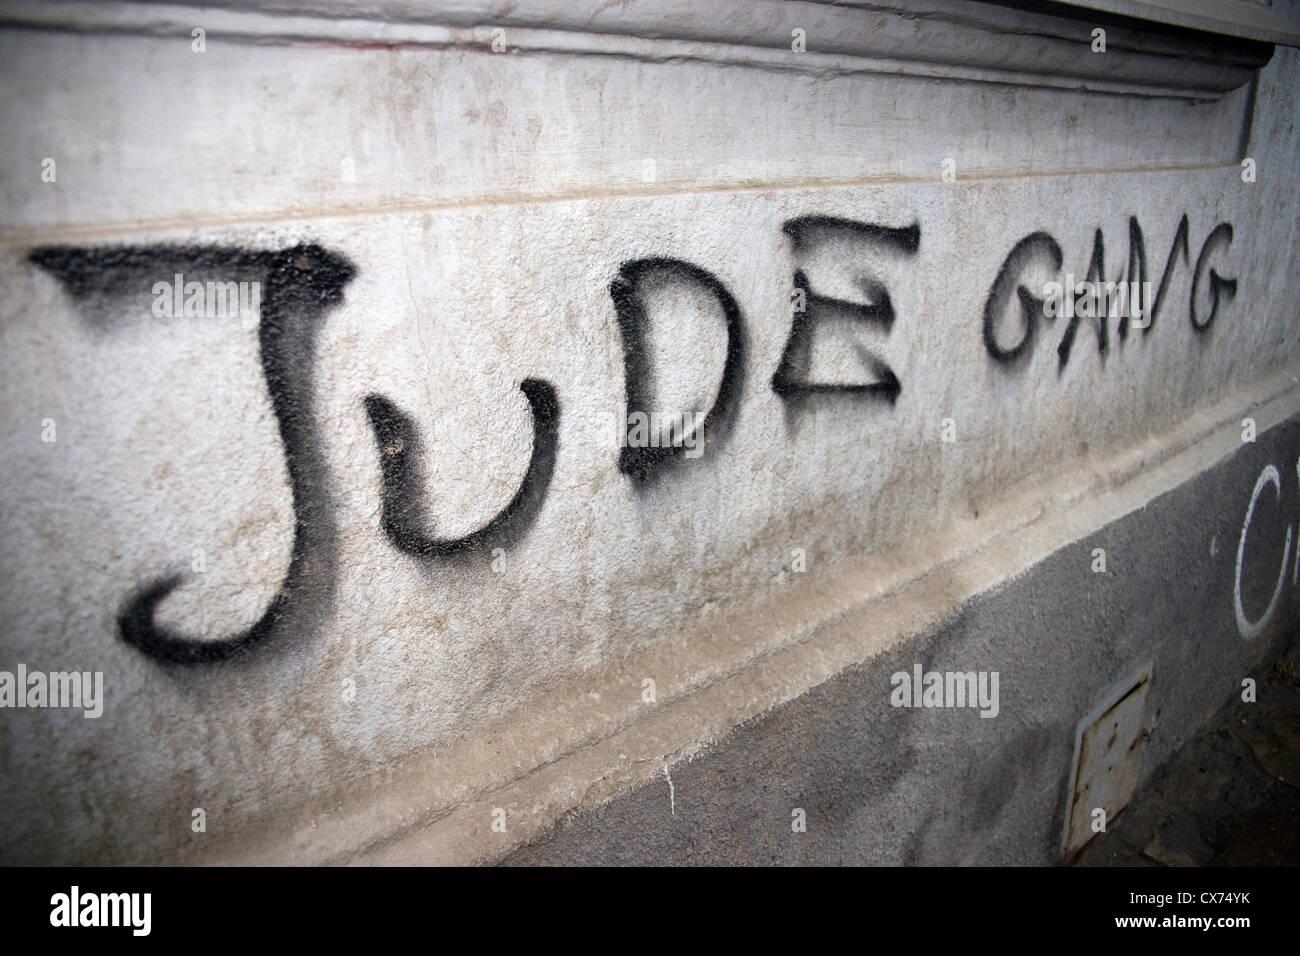 graffiti caption of Jude Gang in Krakow Poland - Stock Image